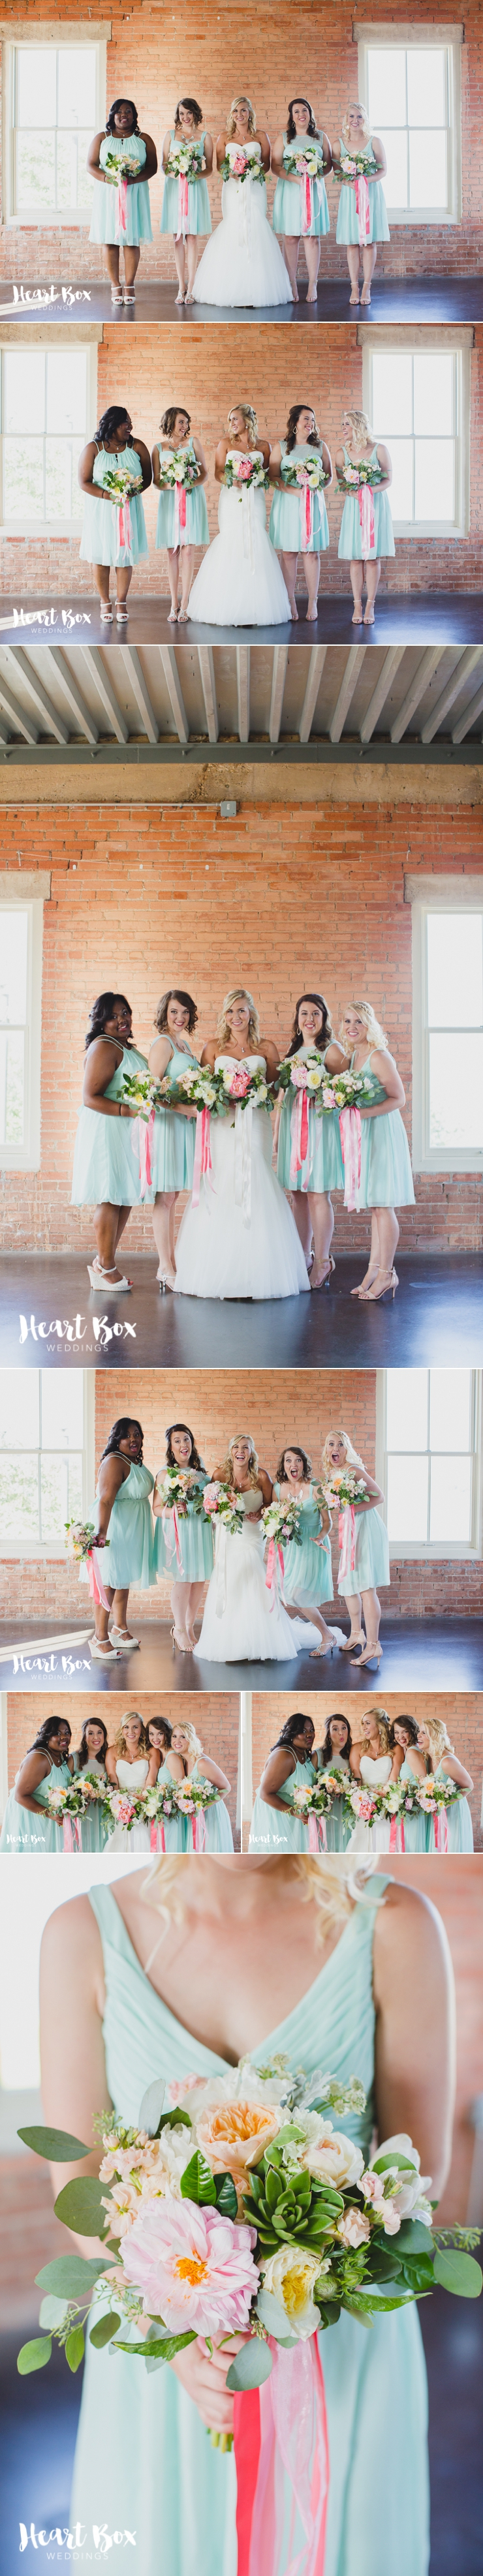 Gould Wedding Blog Collages 7.jpg